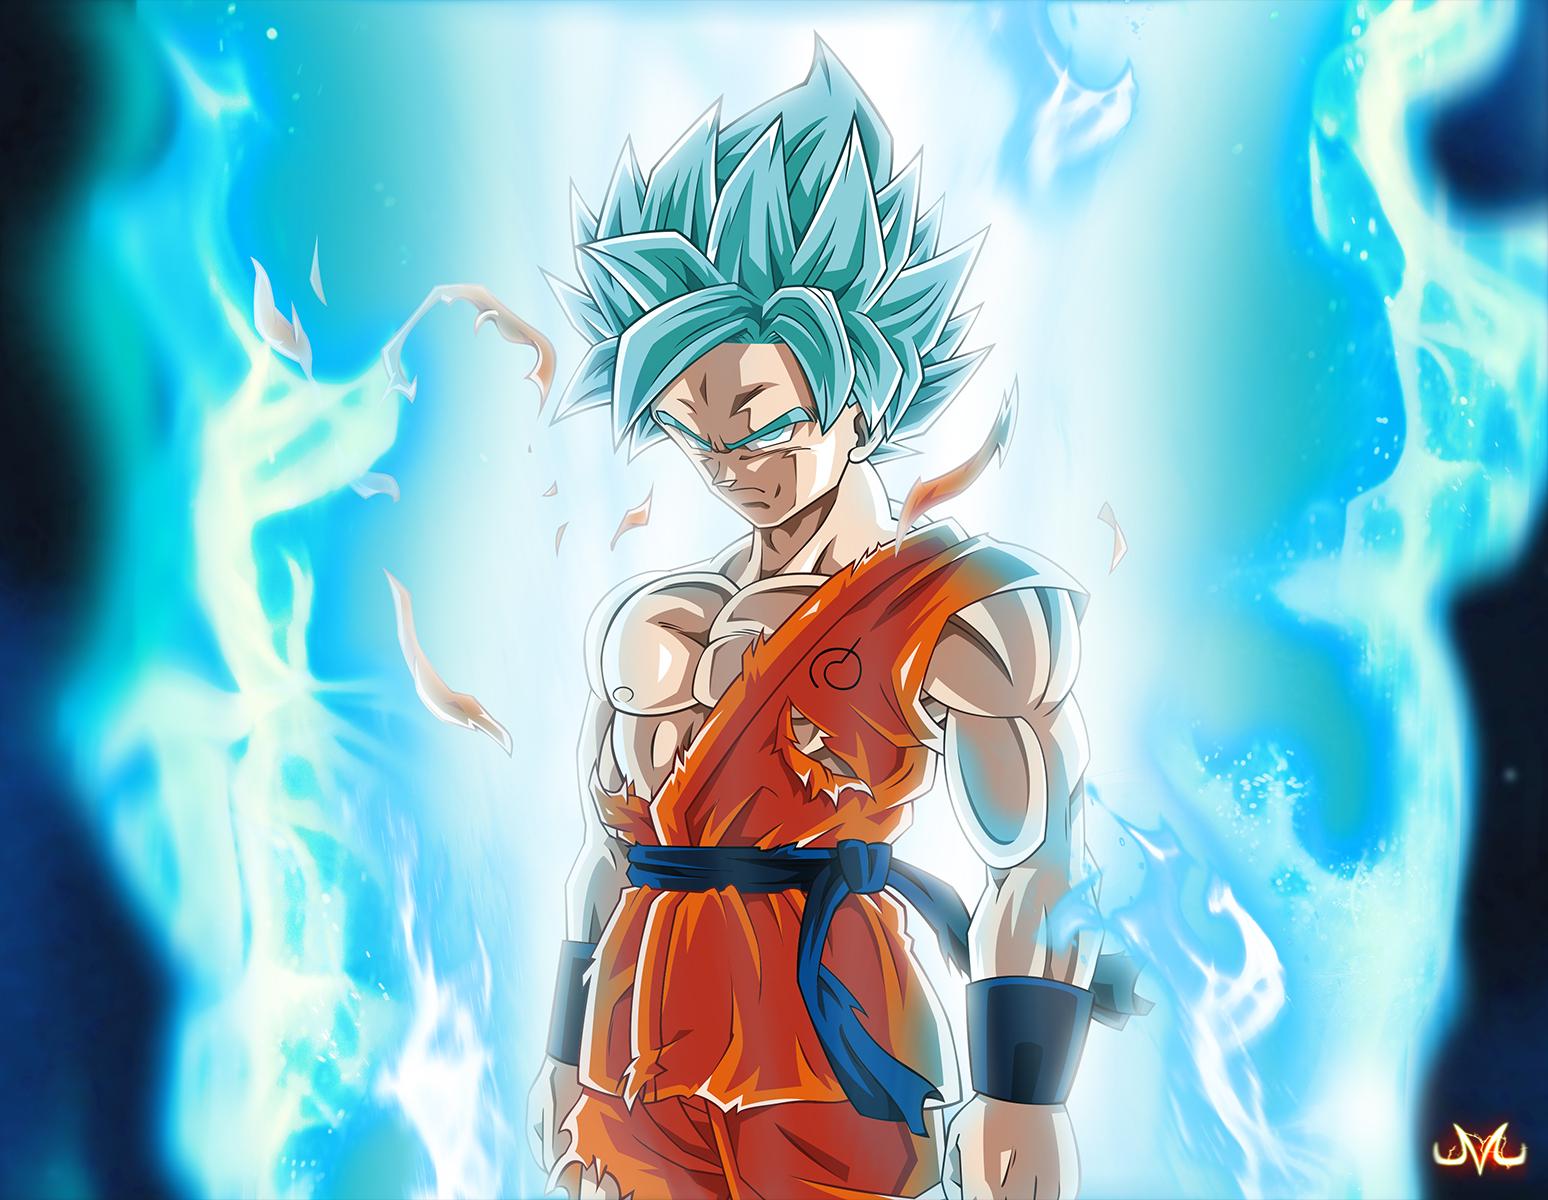 SSGSS Goku Wallpaper - WallpaperSafari